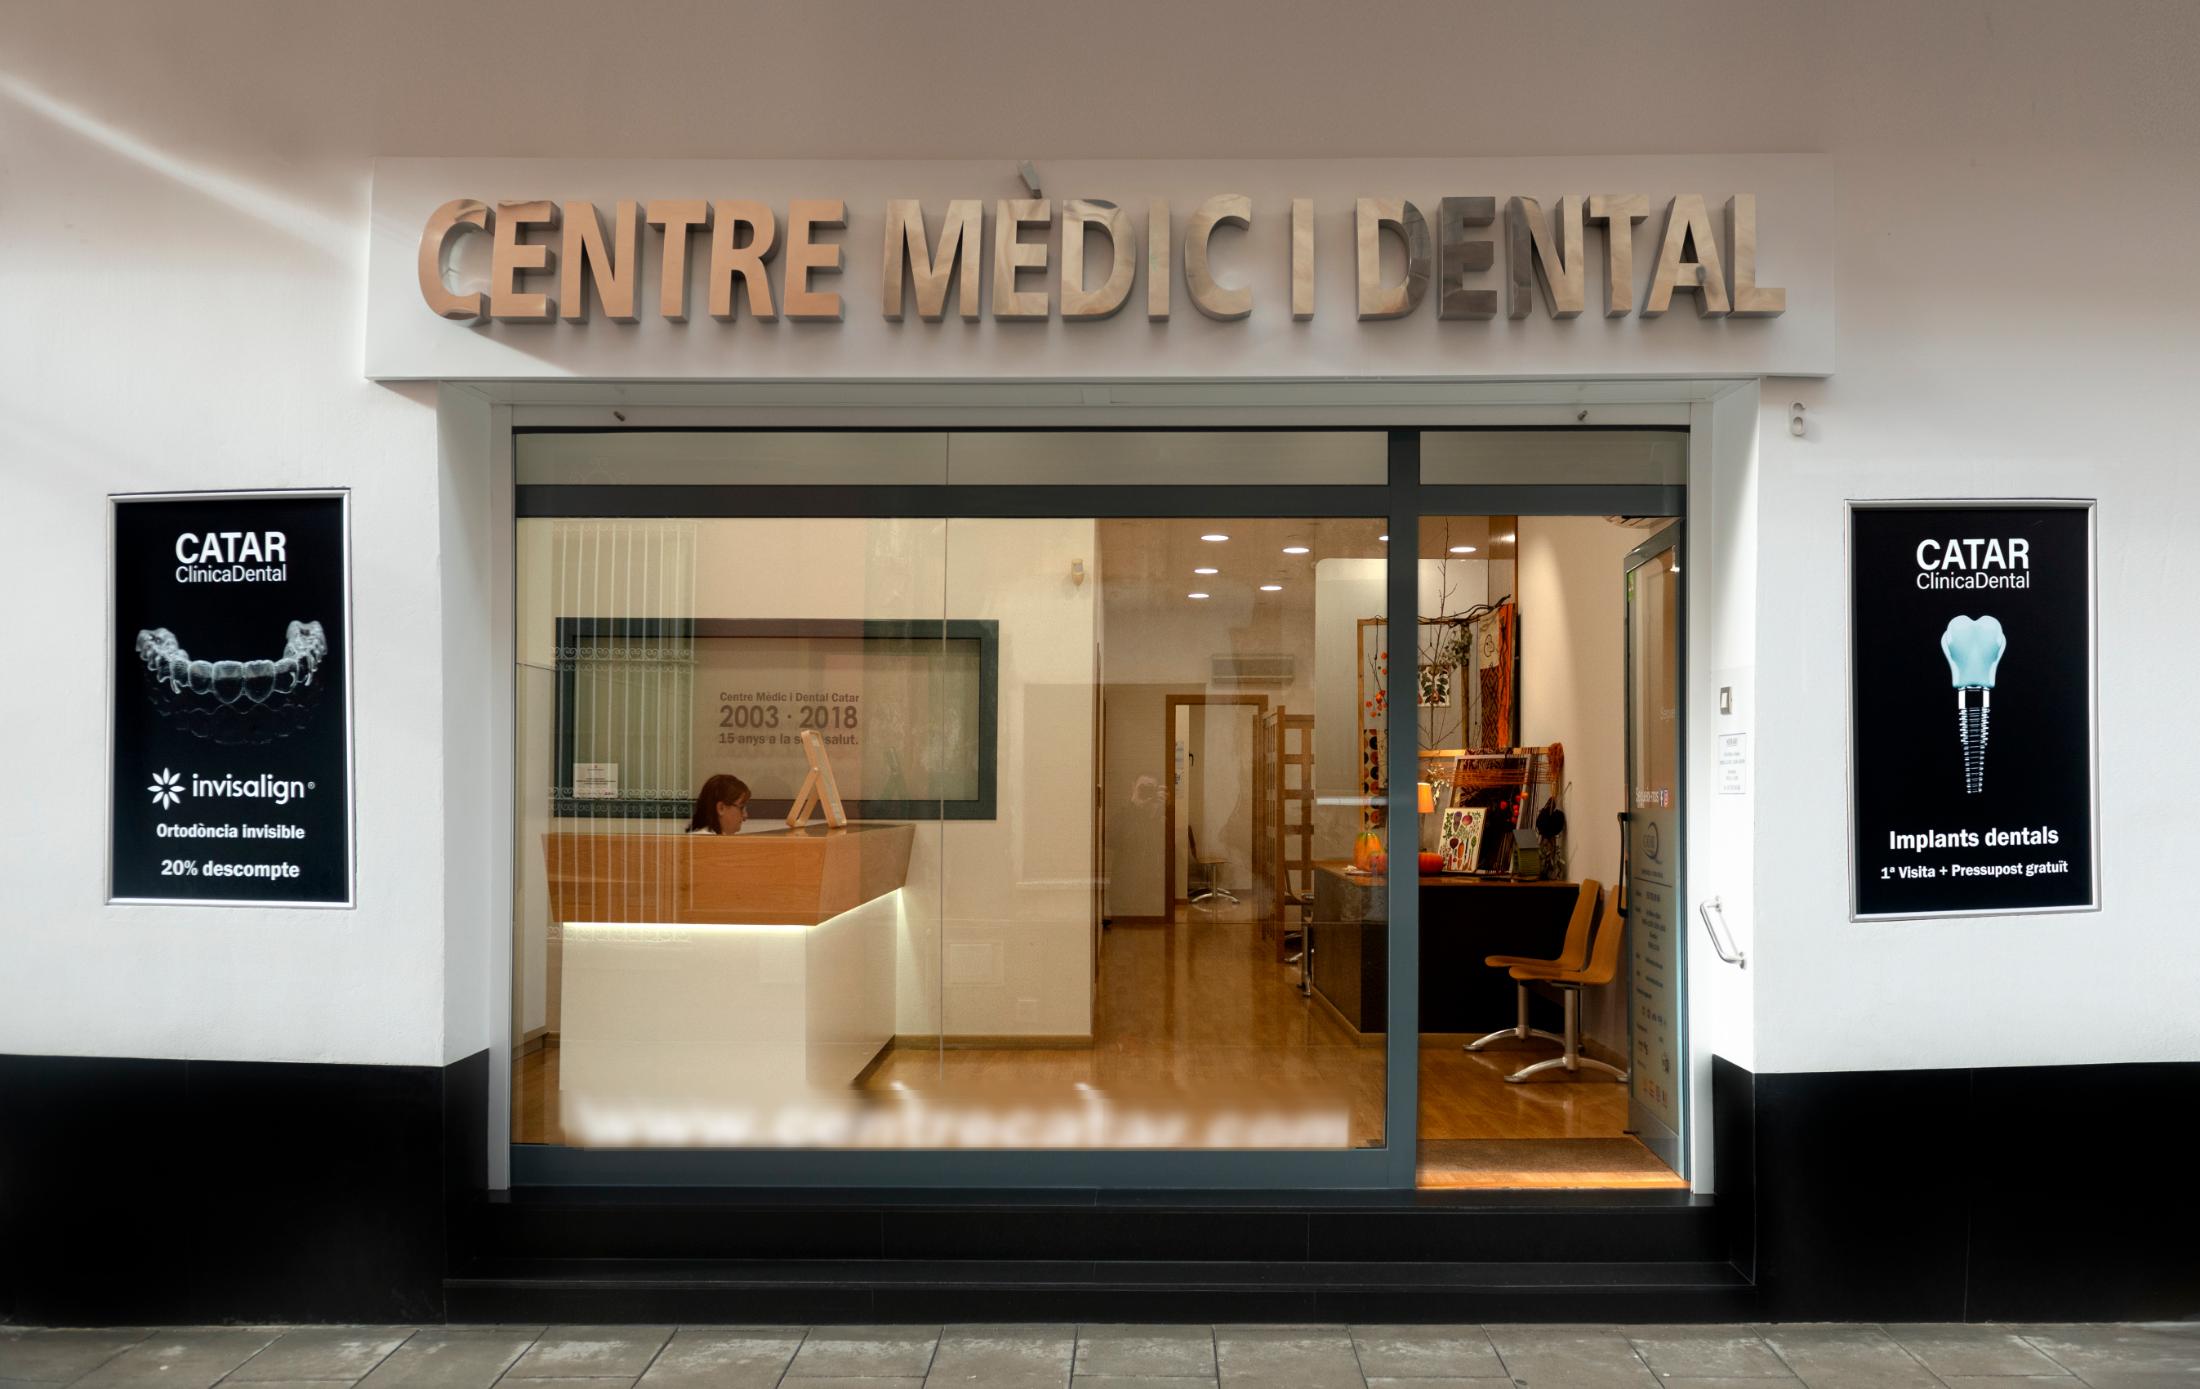 Catar Clinica Dental